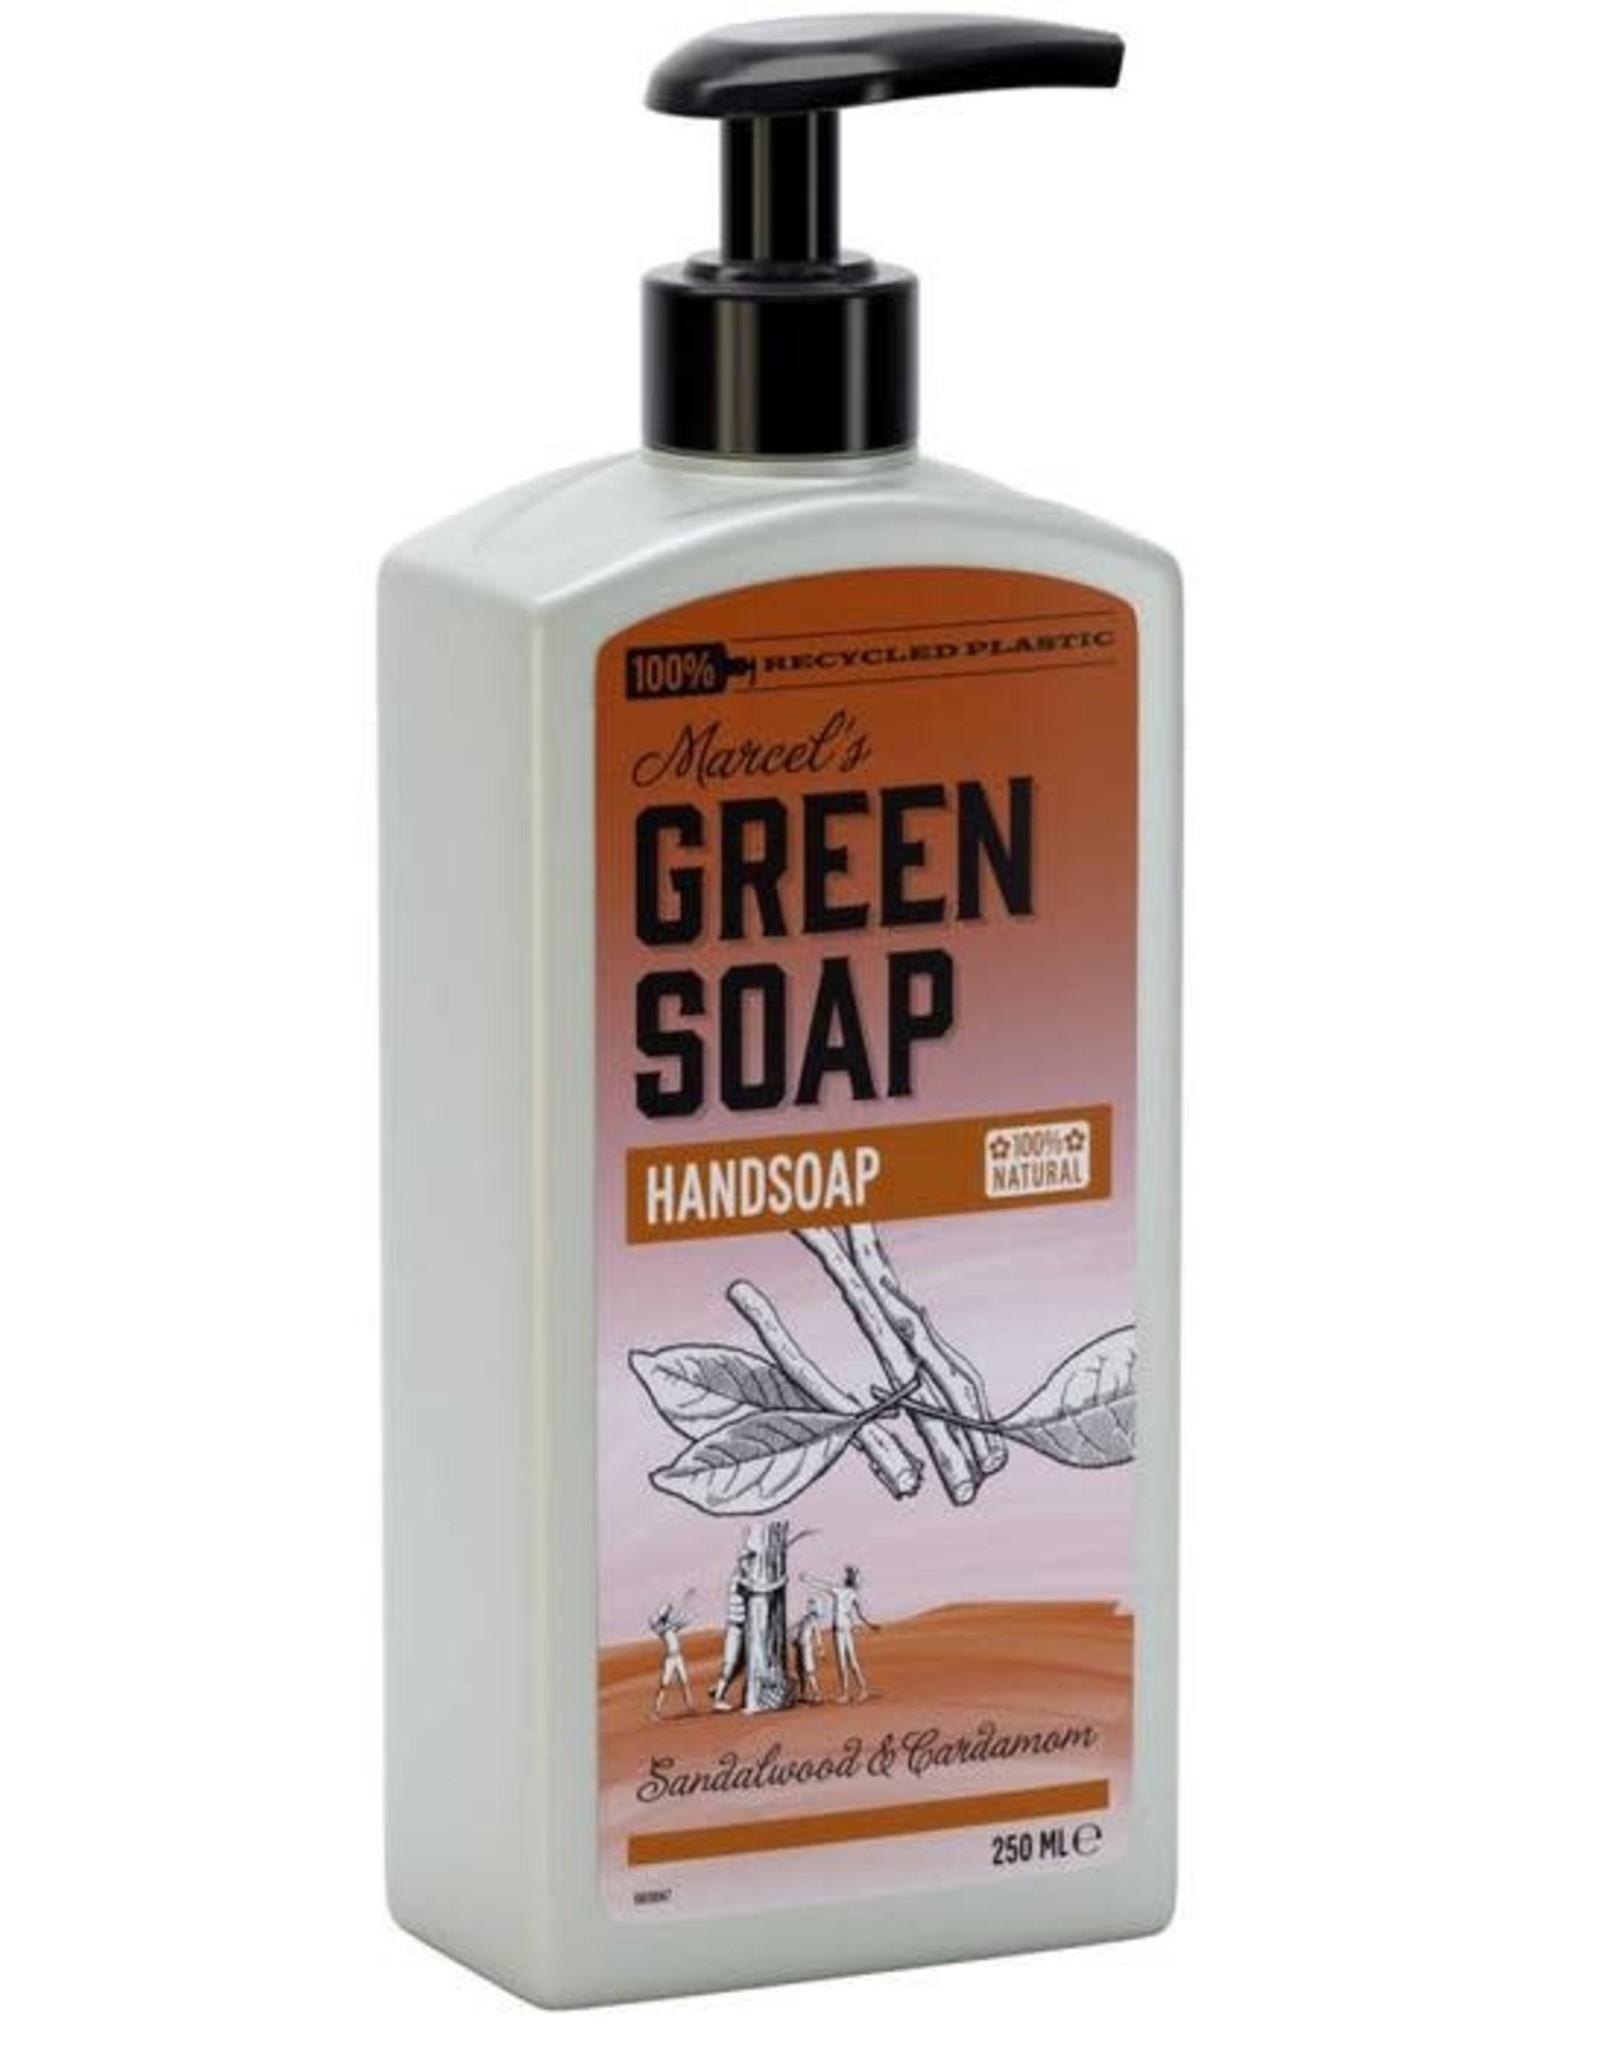 Marcel's Green Soap Handsoap Sandelwood & Cardemom 250 ml